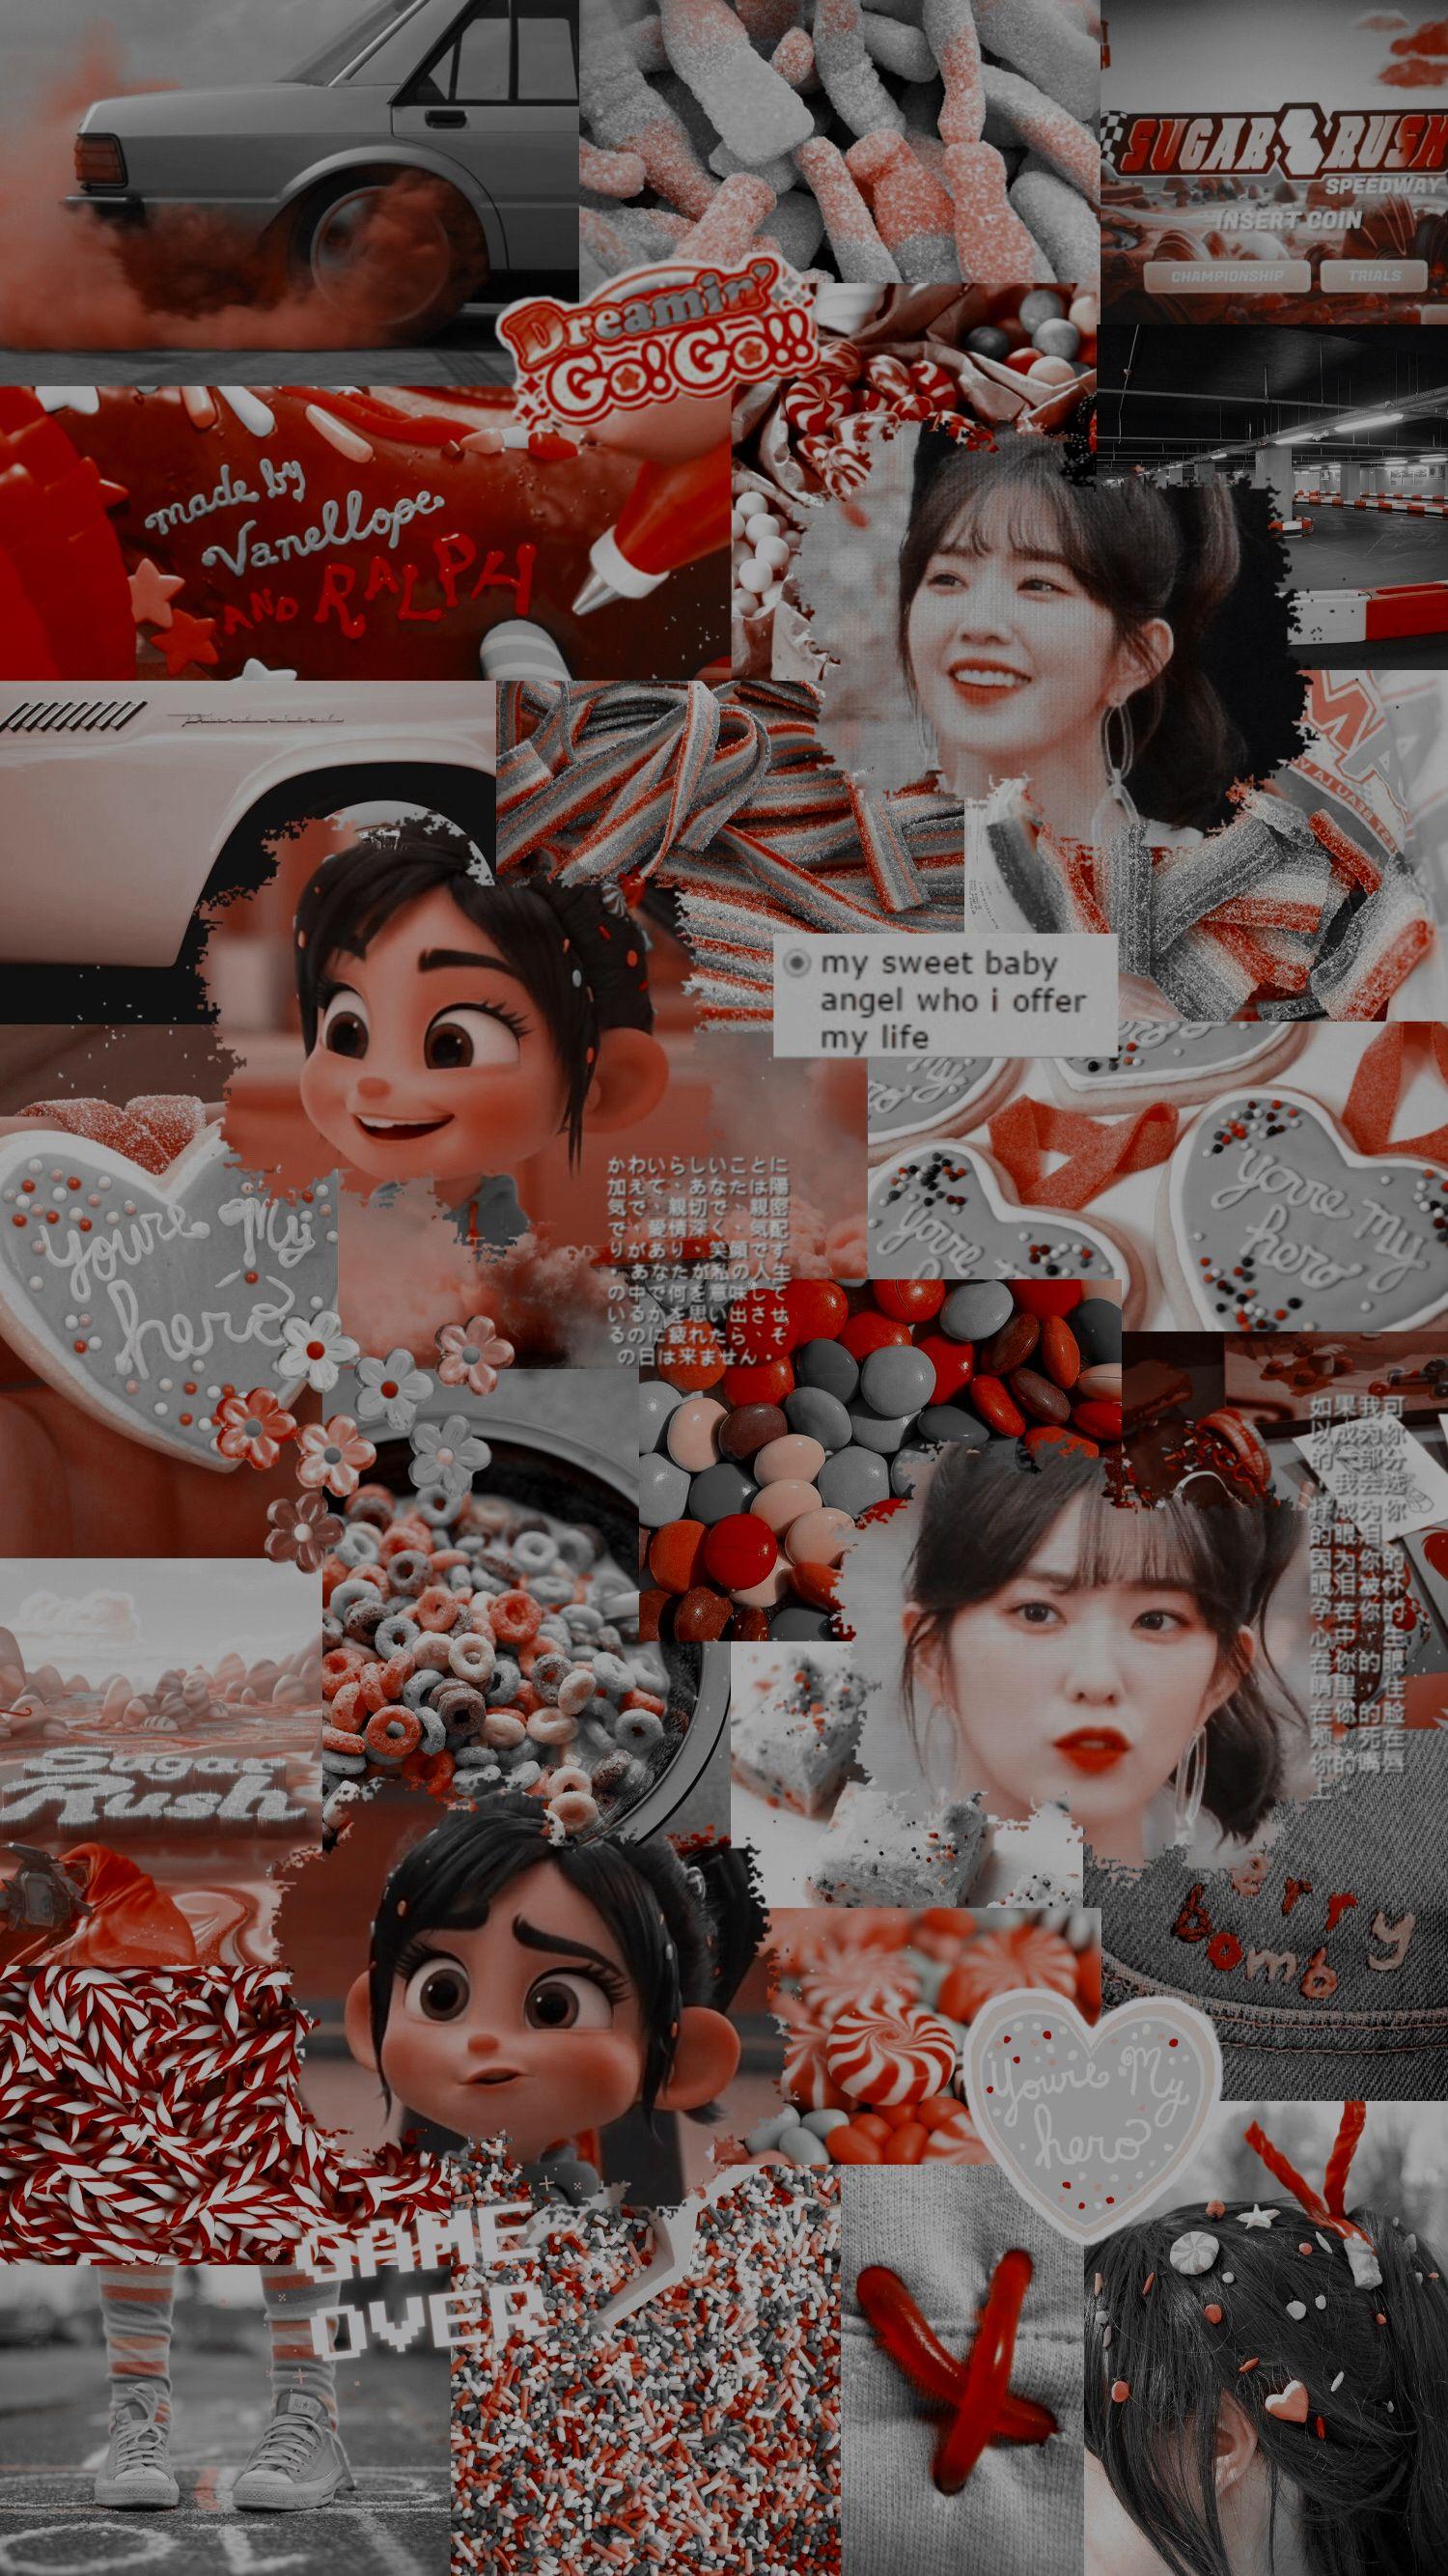 Pin By Hager Salah On خلفيات كيوت كوريه In 2020 Velvet Wallpaper Wallpaper Iphone Cute Aesthetic Iphone Wallpaper